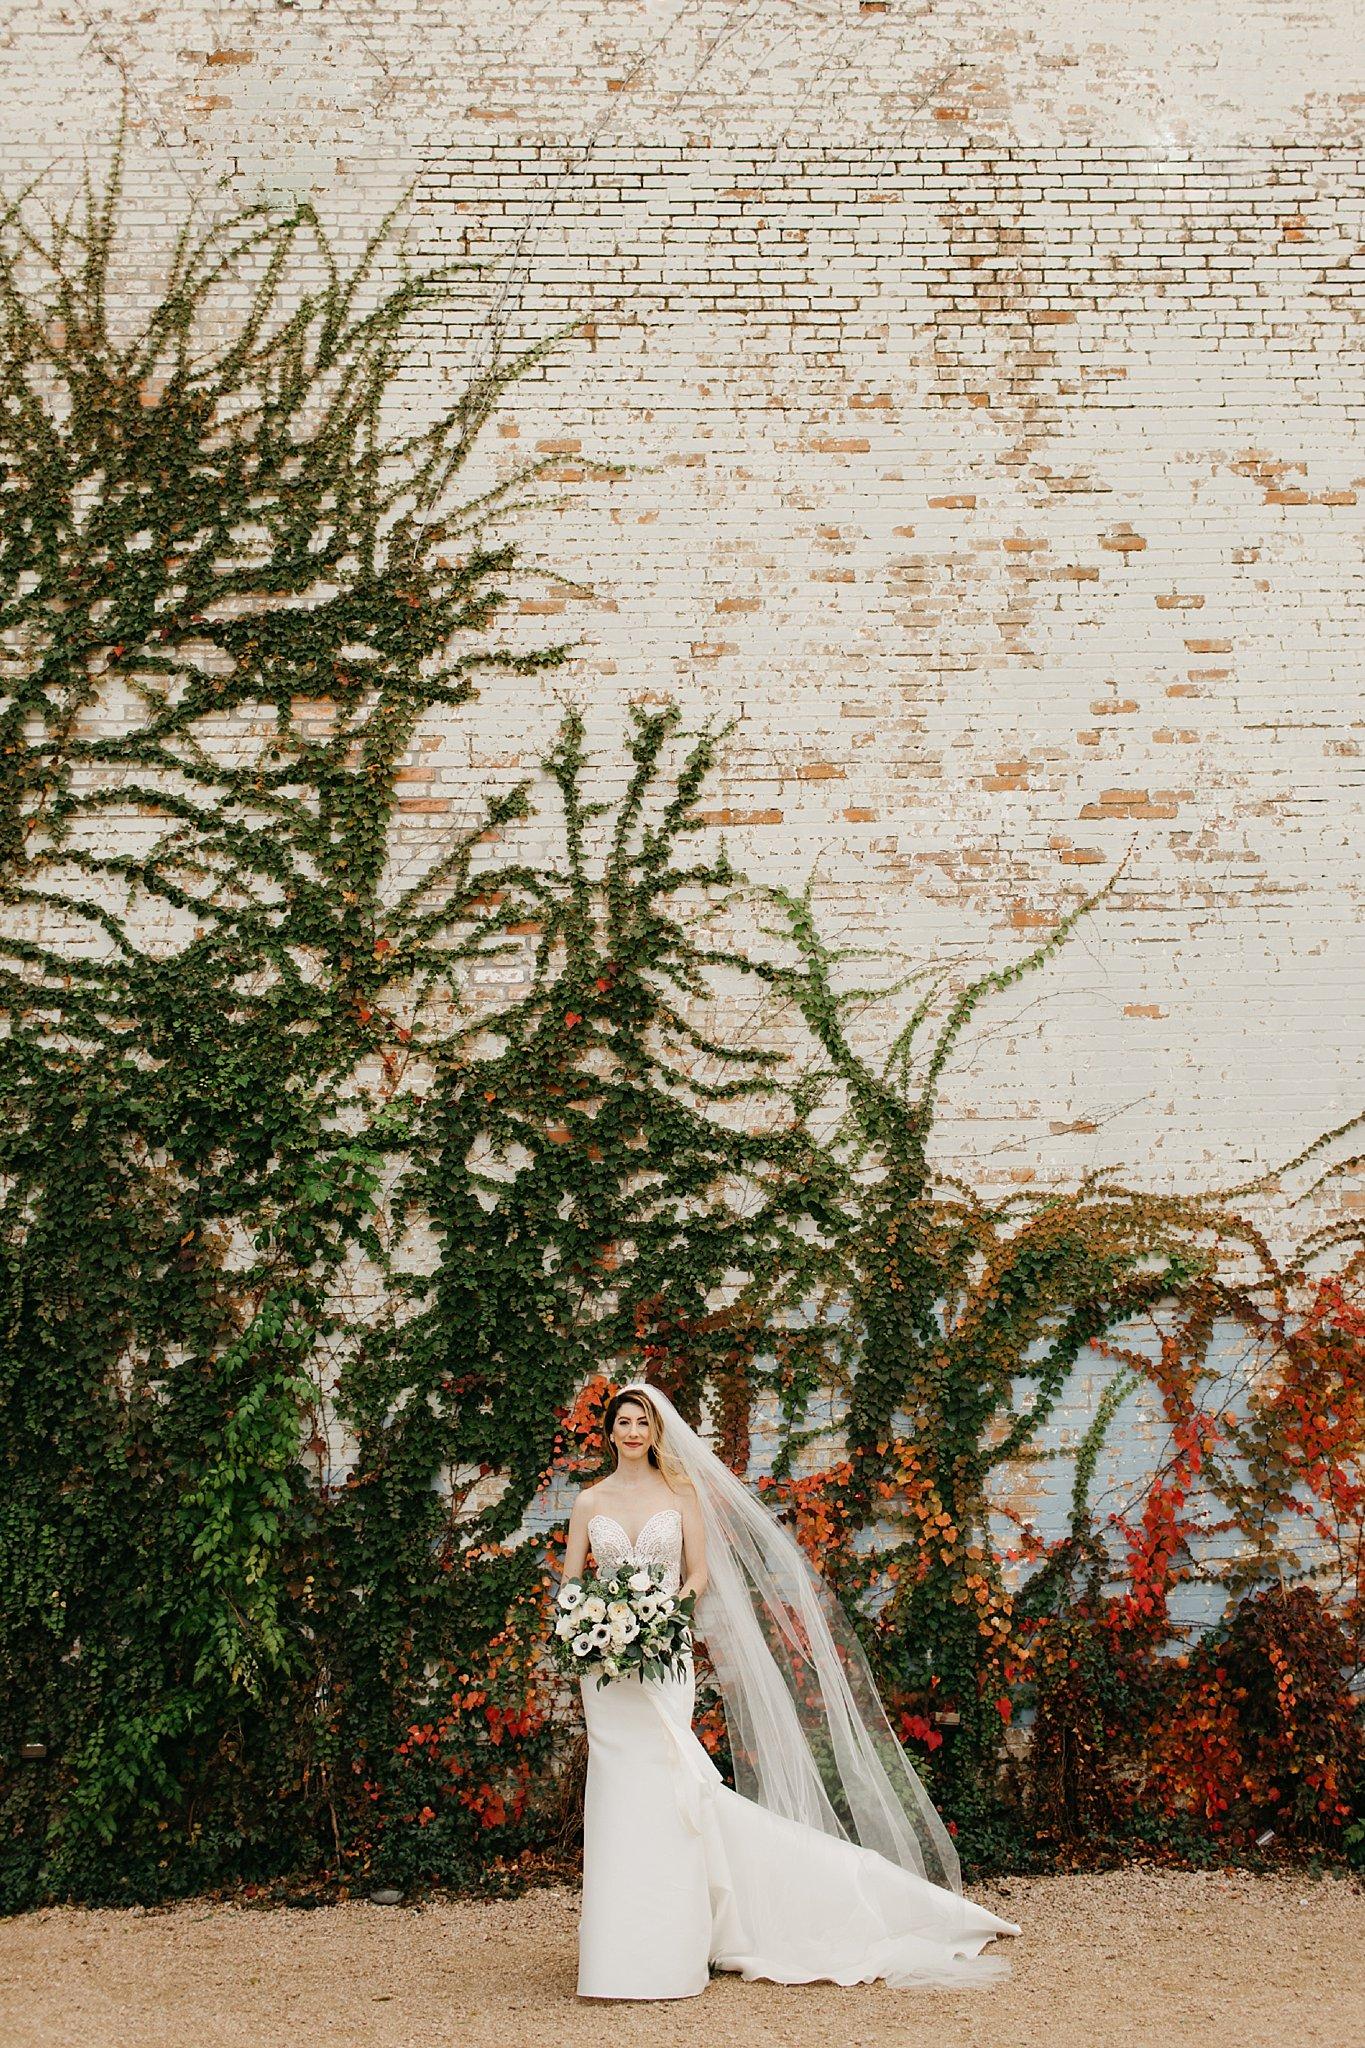 Wilderlove Co_Fort Worth Texas_Brik Venue_Wedding Photography_0123.jpg